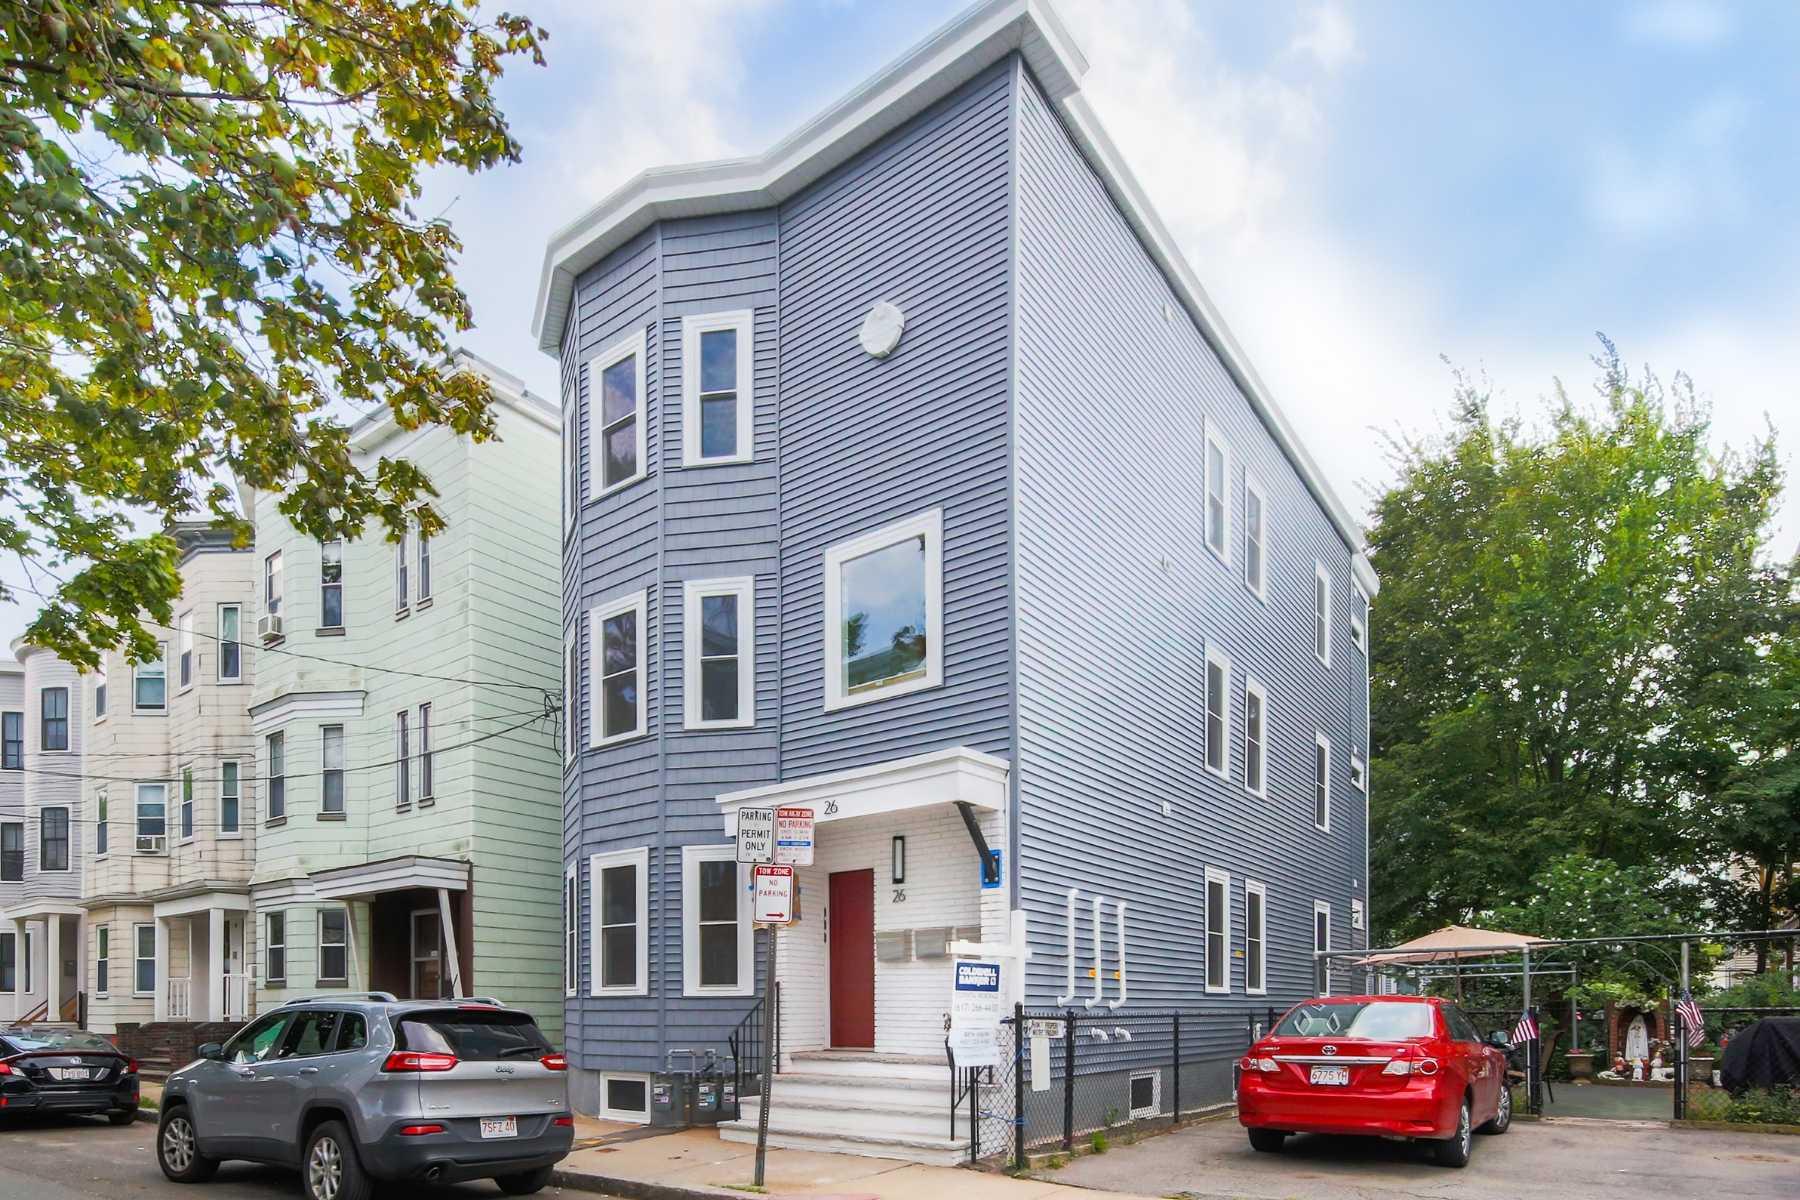 1-CapstoneCommunities-property-26HardwickStreet-Condominiums-Cambridge.jpg